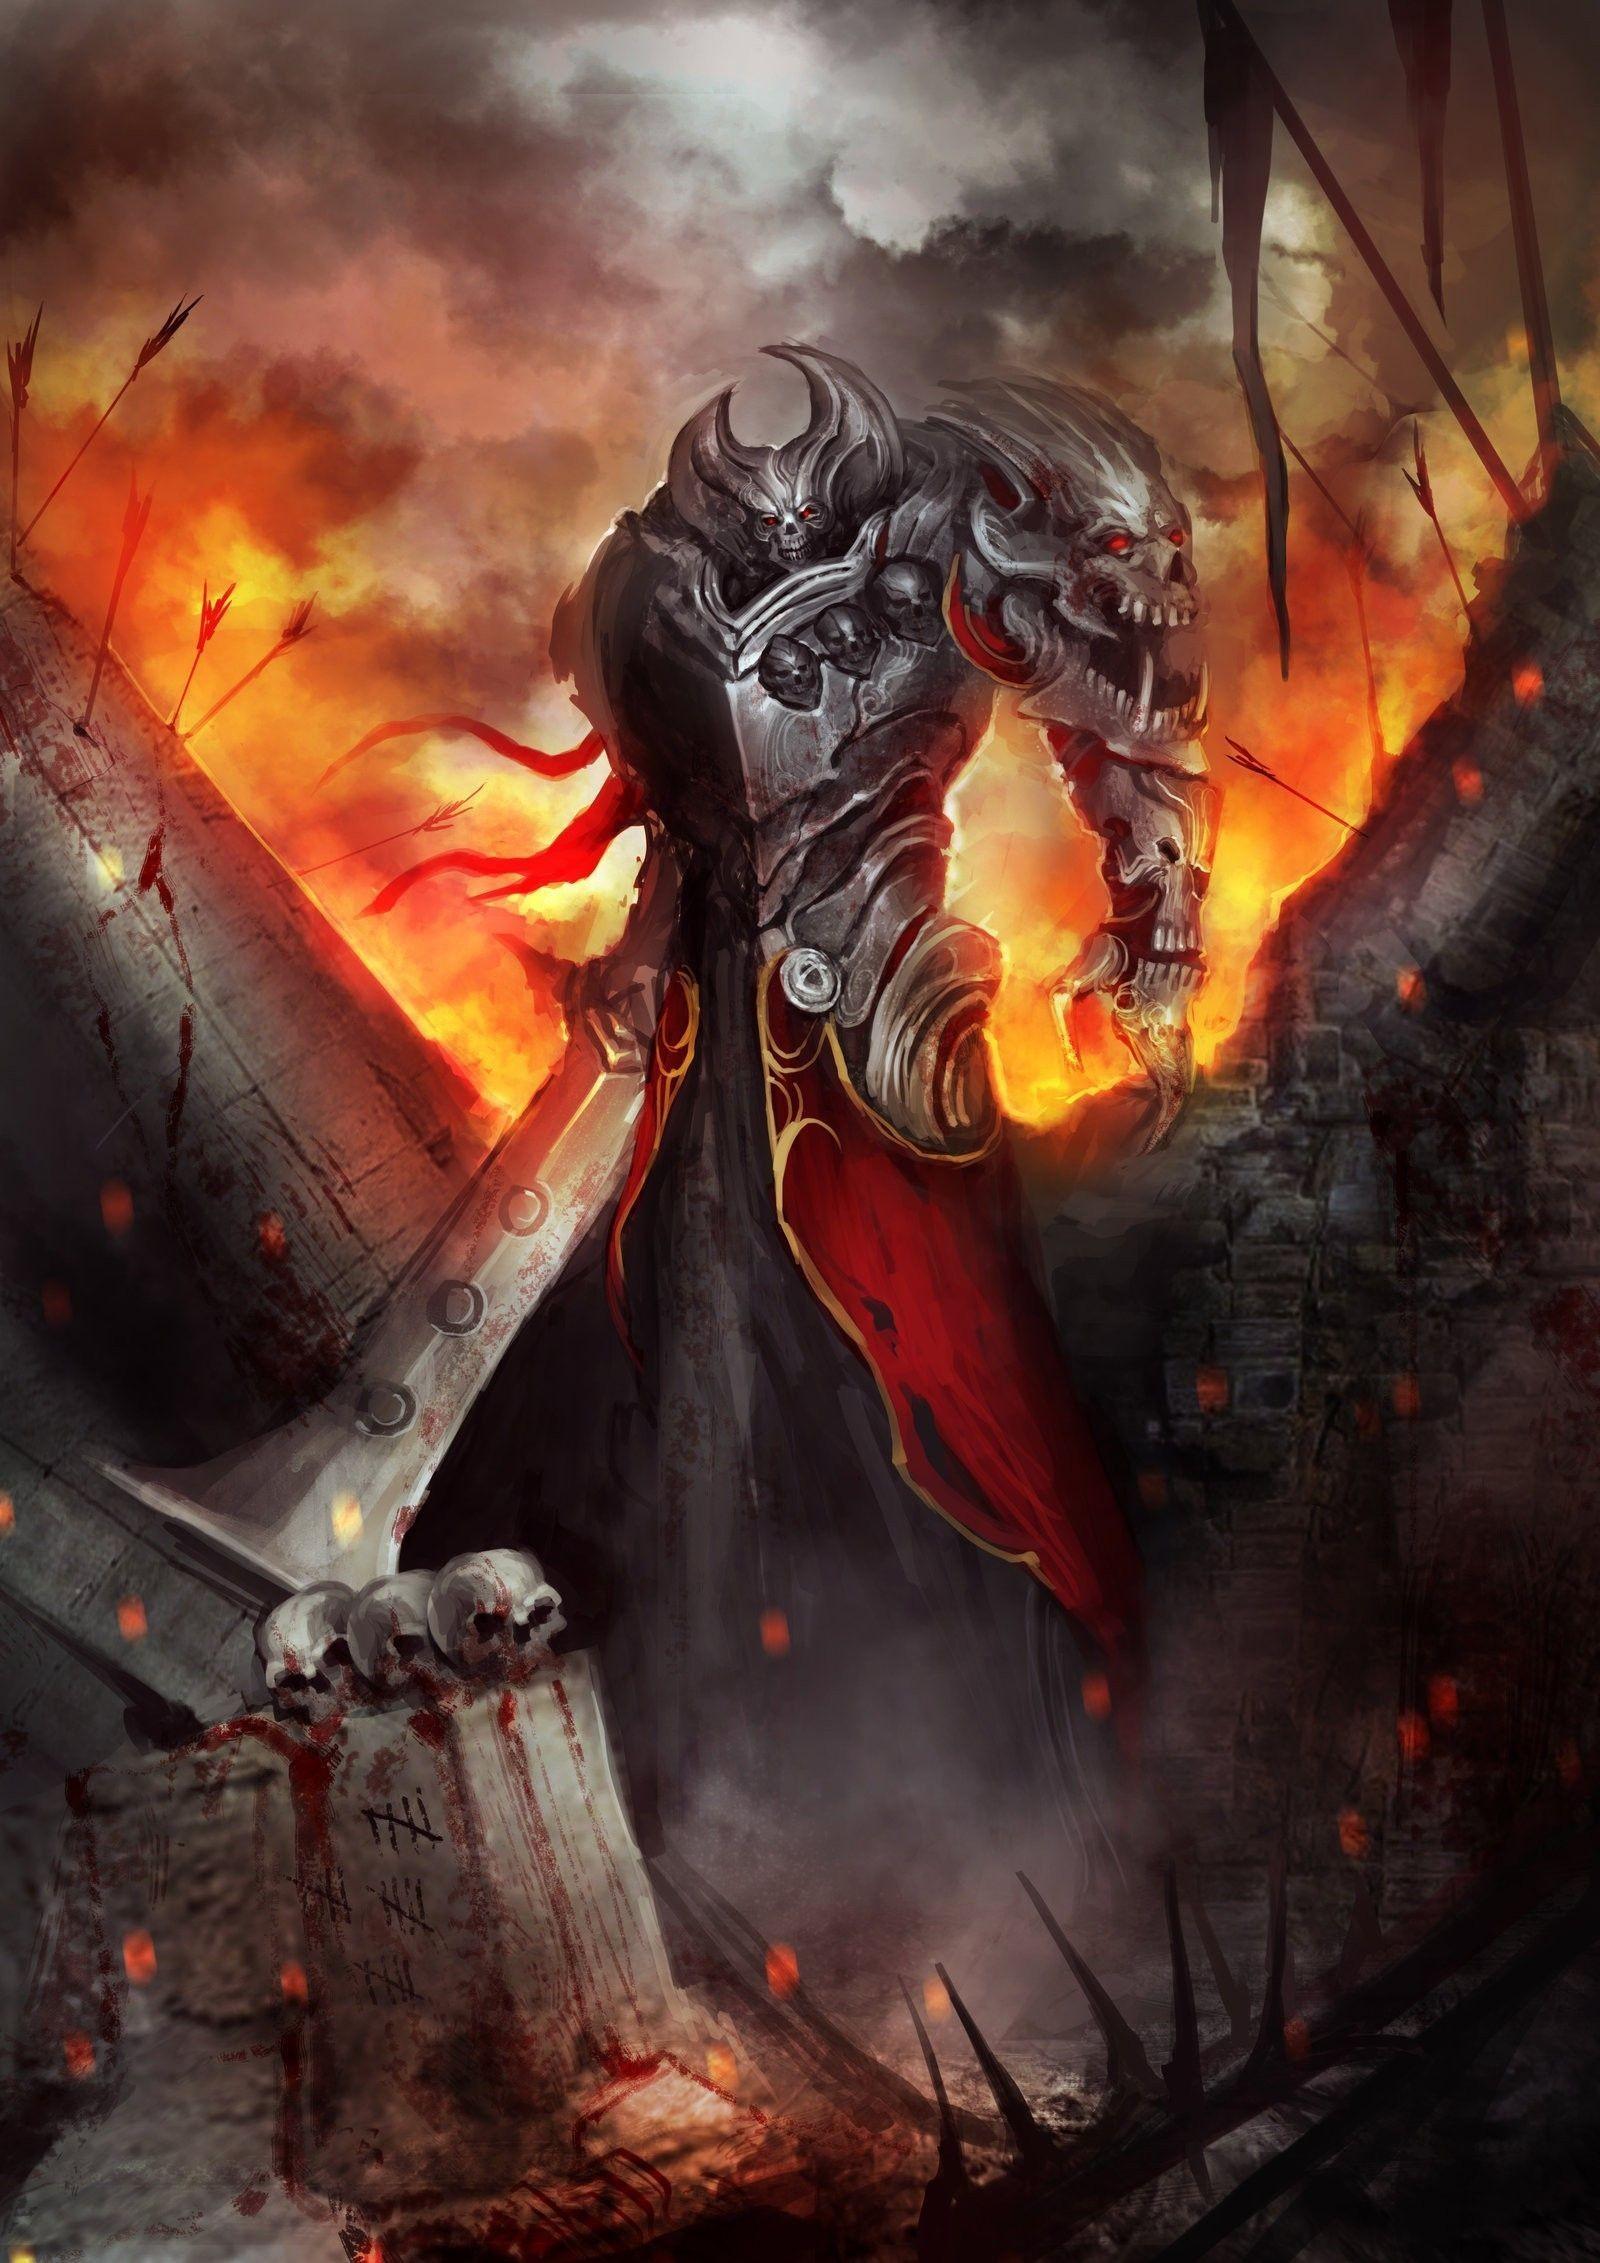 flames, skulls, war, blood, fire, weapons, artwork, swords,